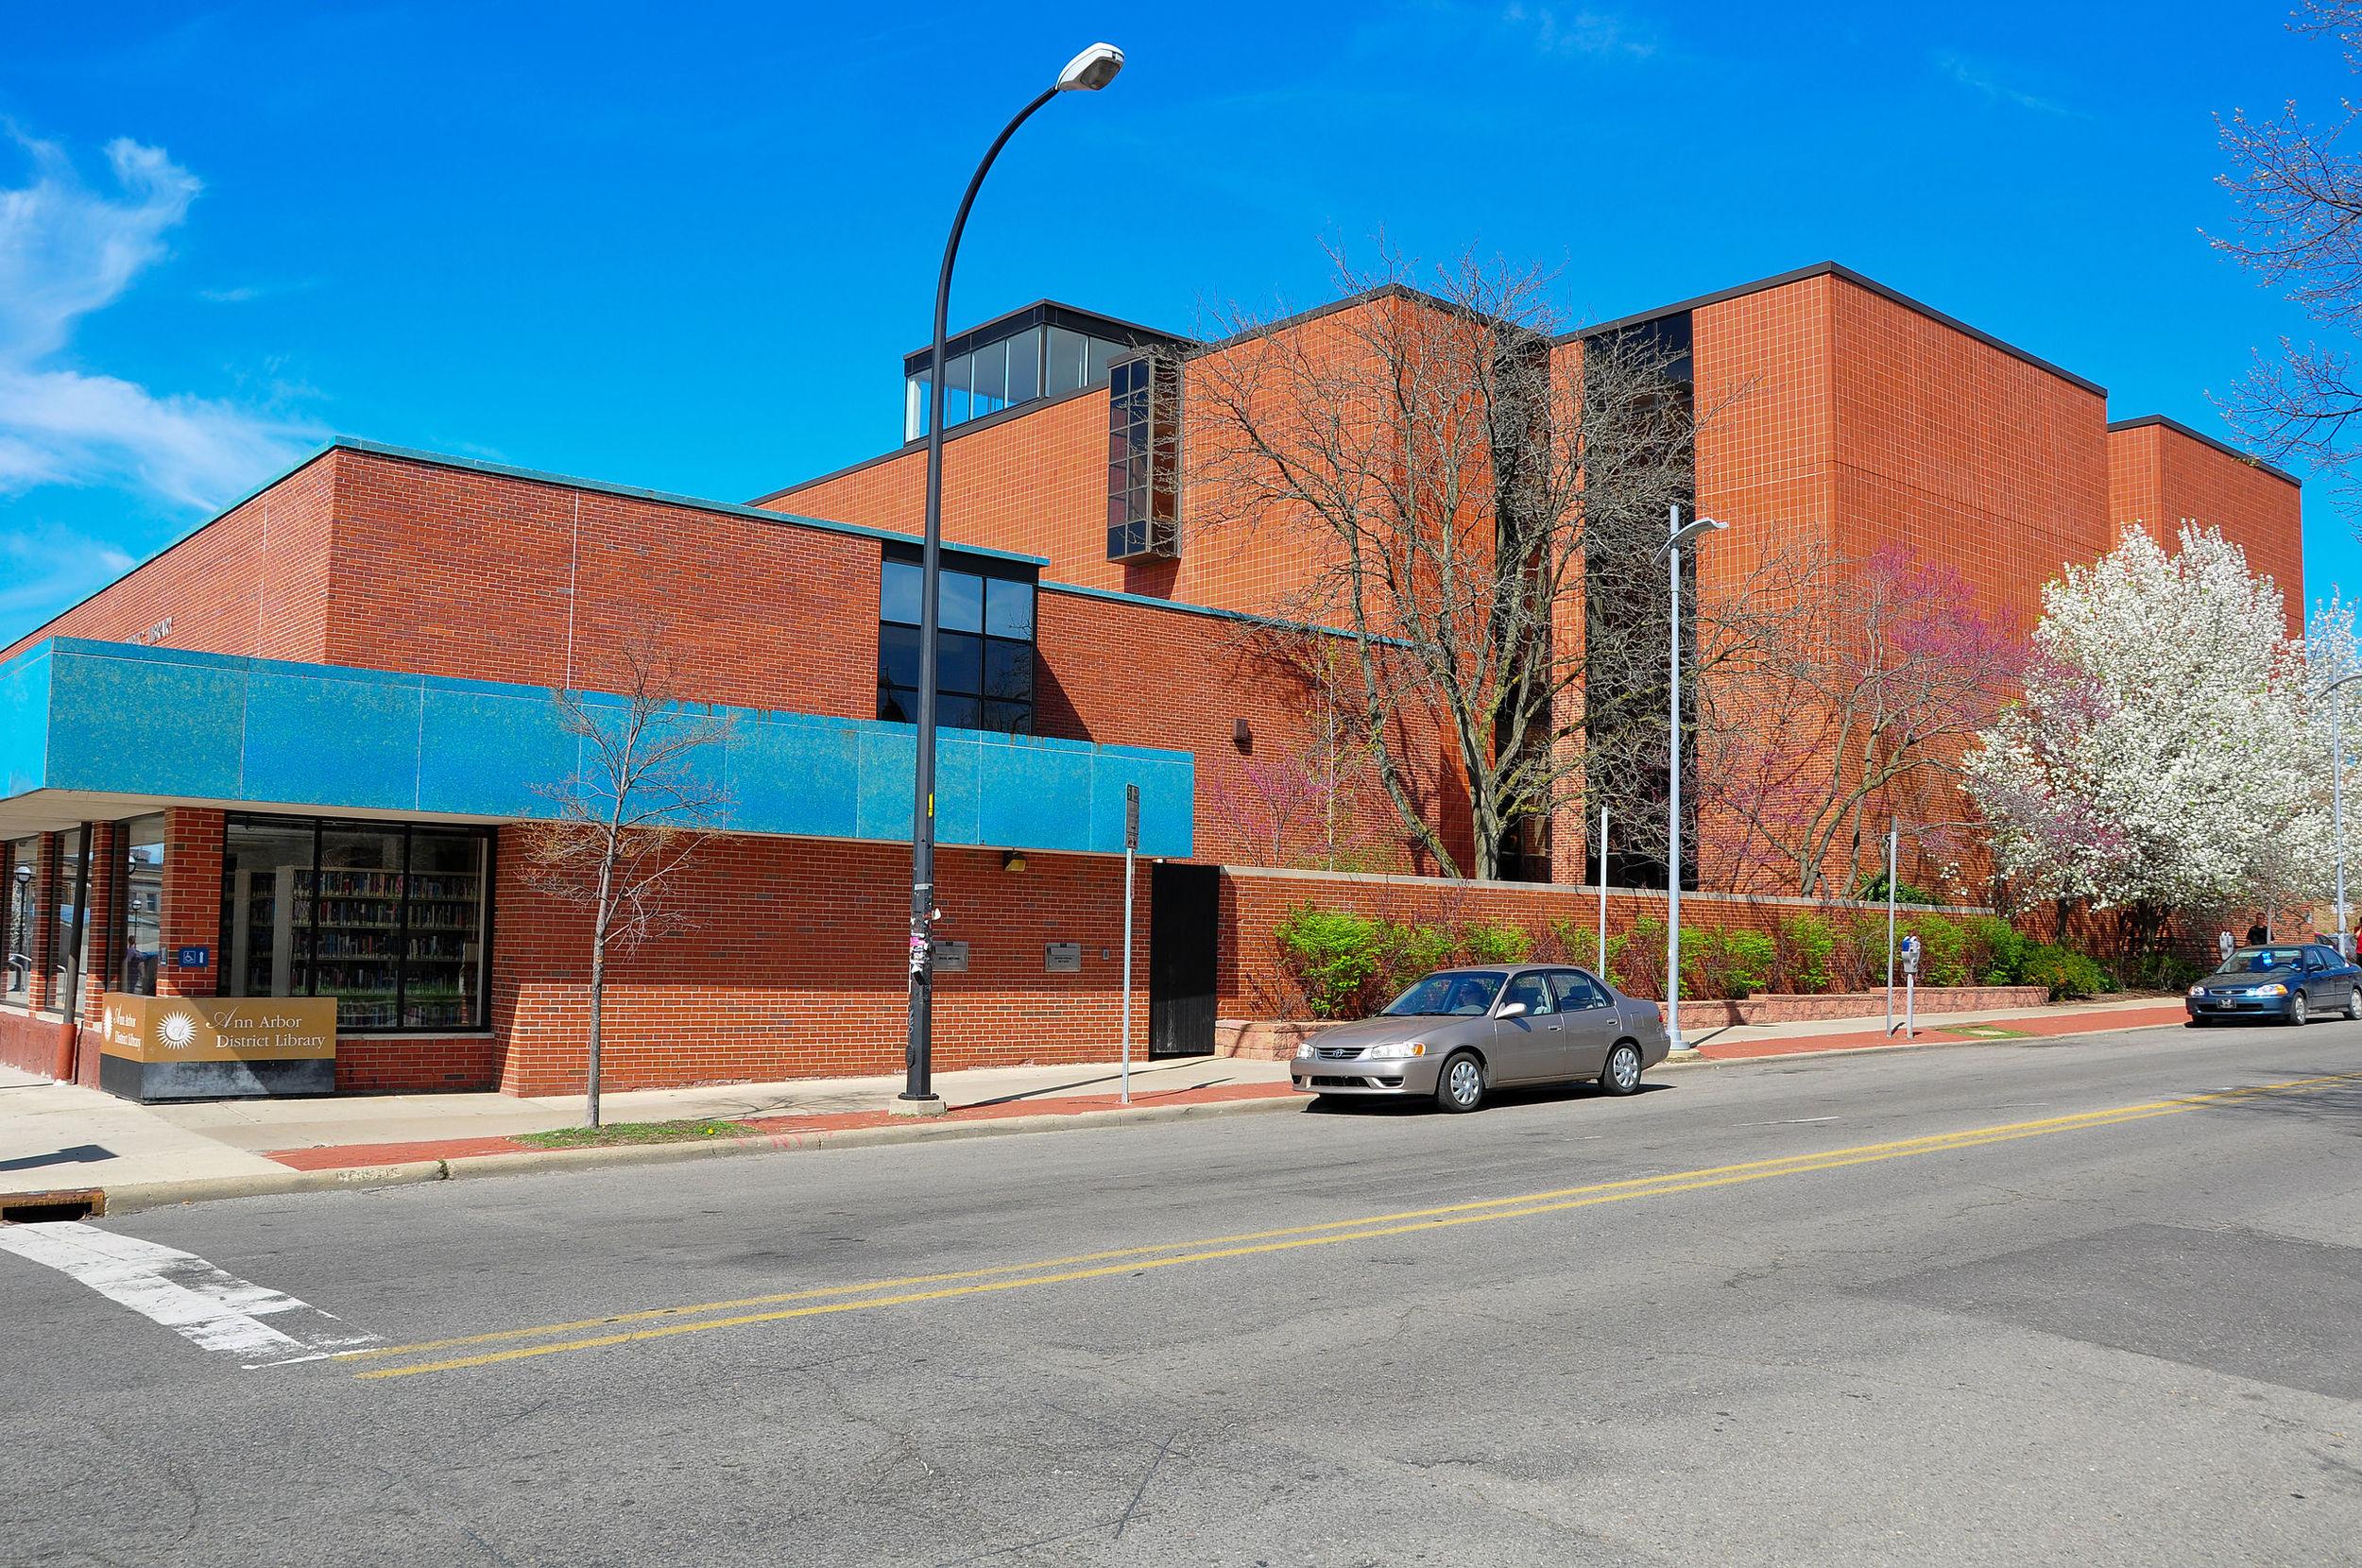 Ann_Arbor_District_Library.jpg